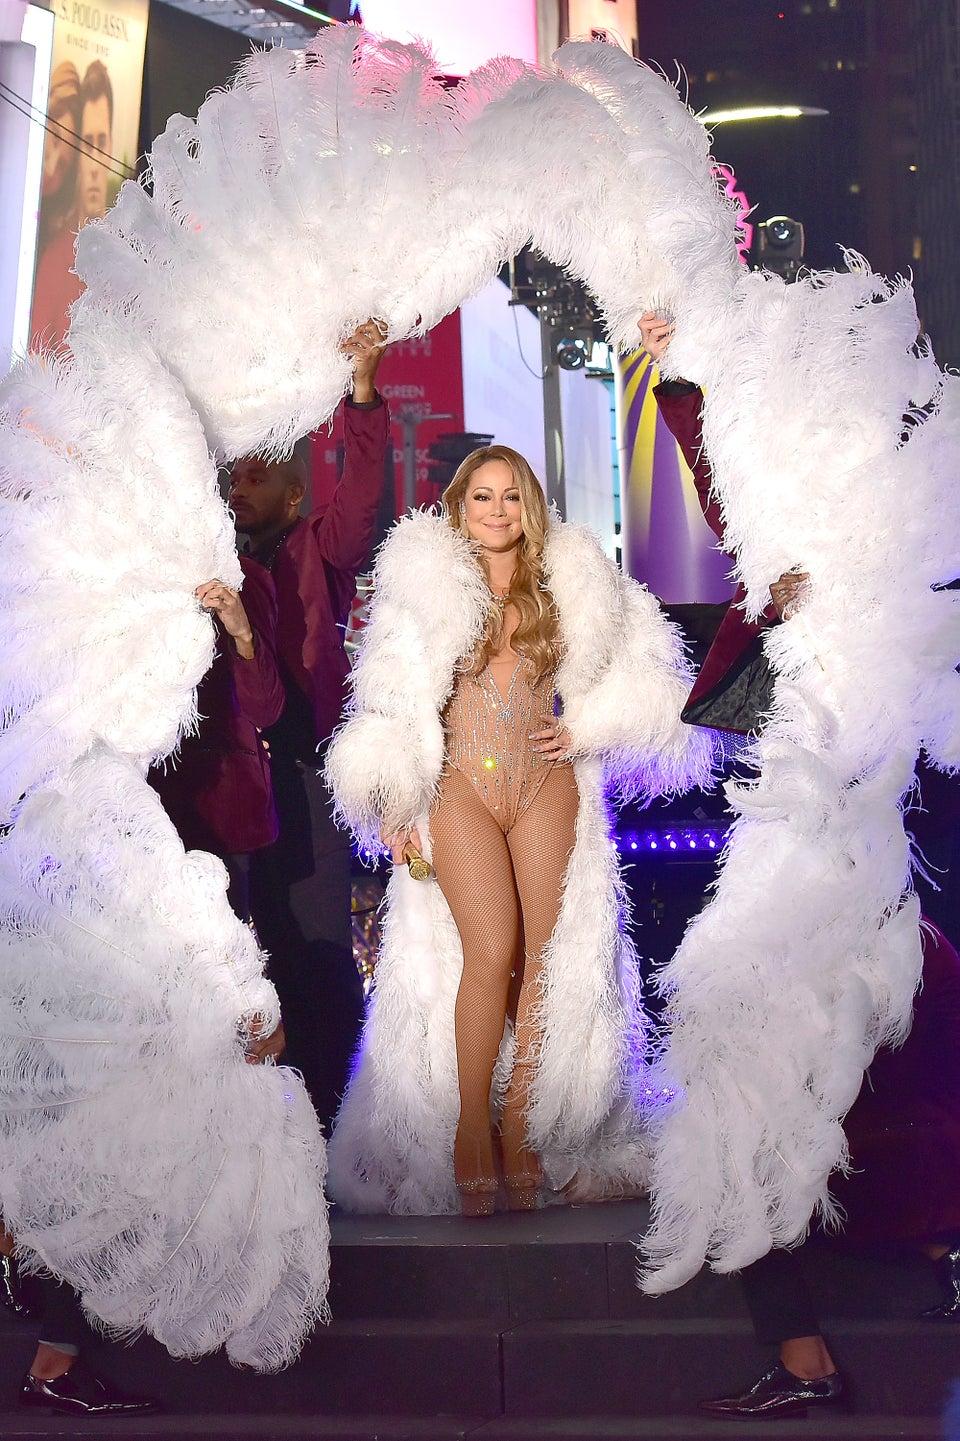 Mariah Carey Will Star in New Docu-Series